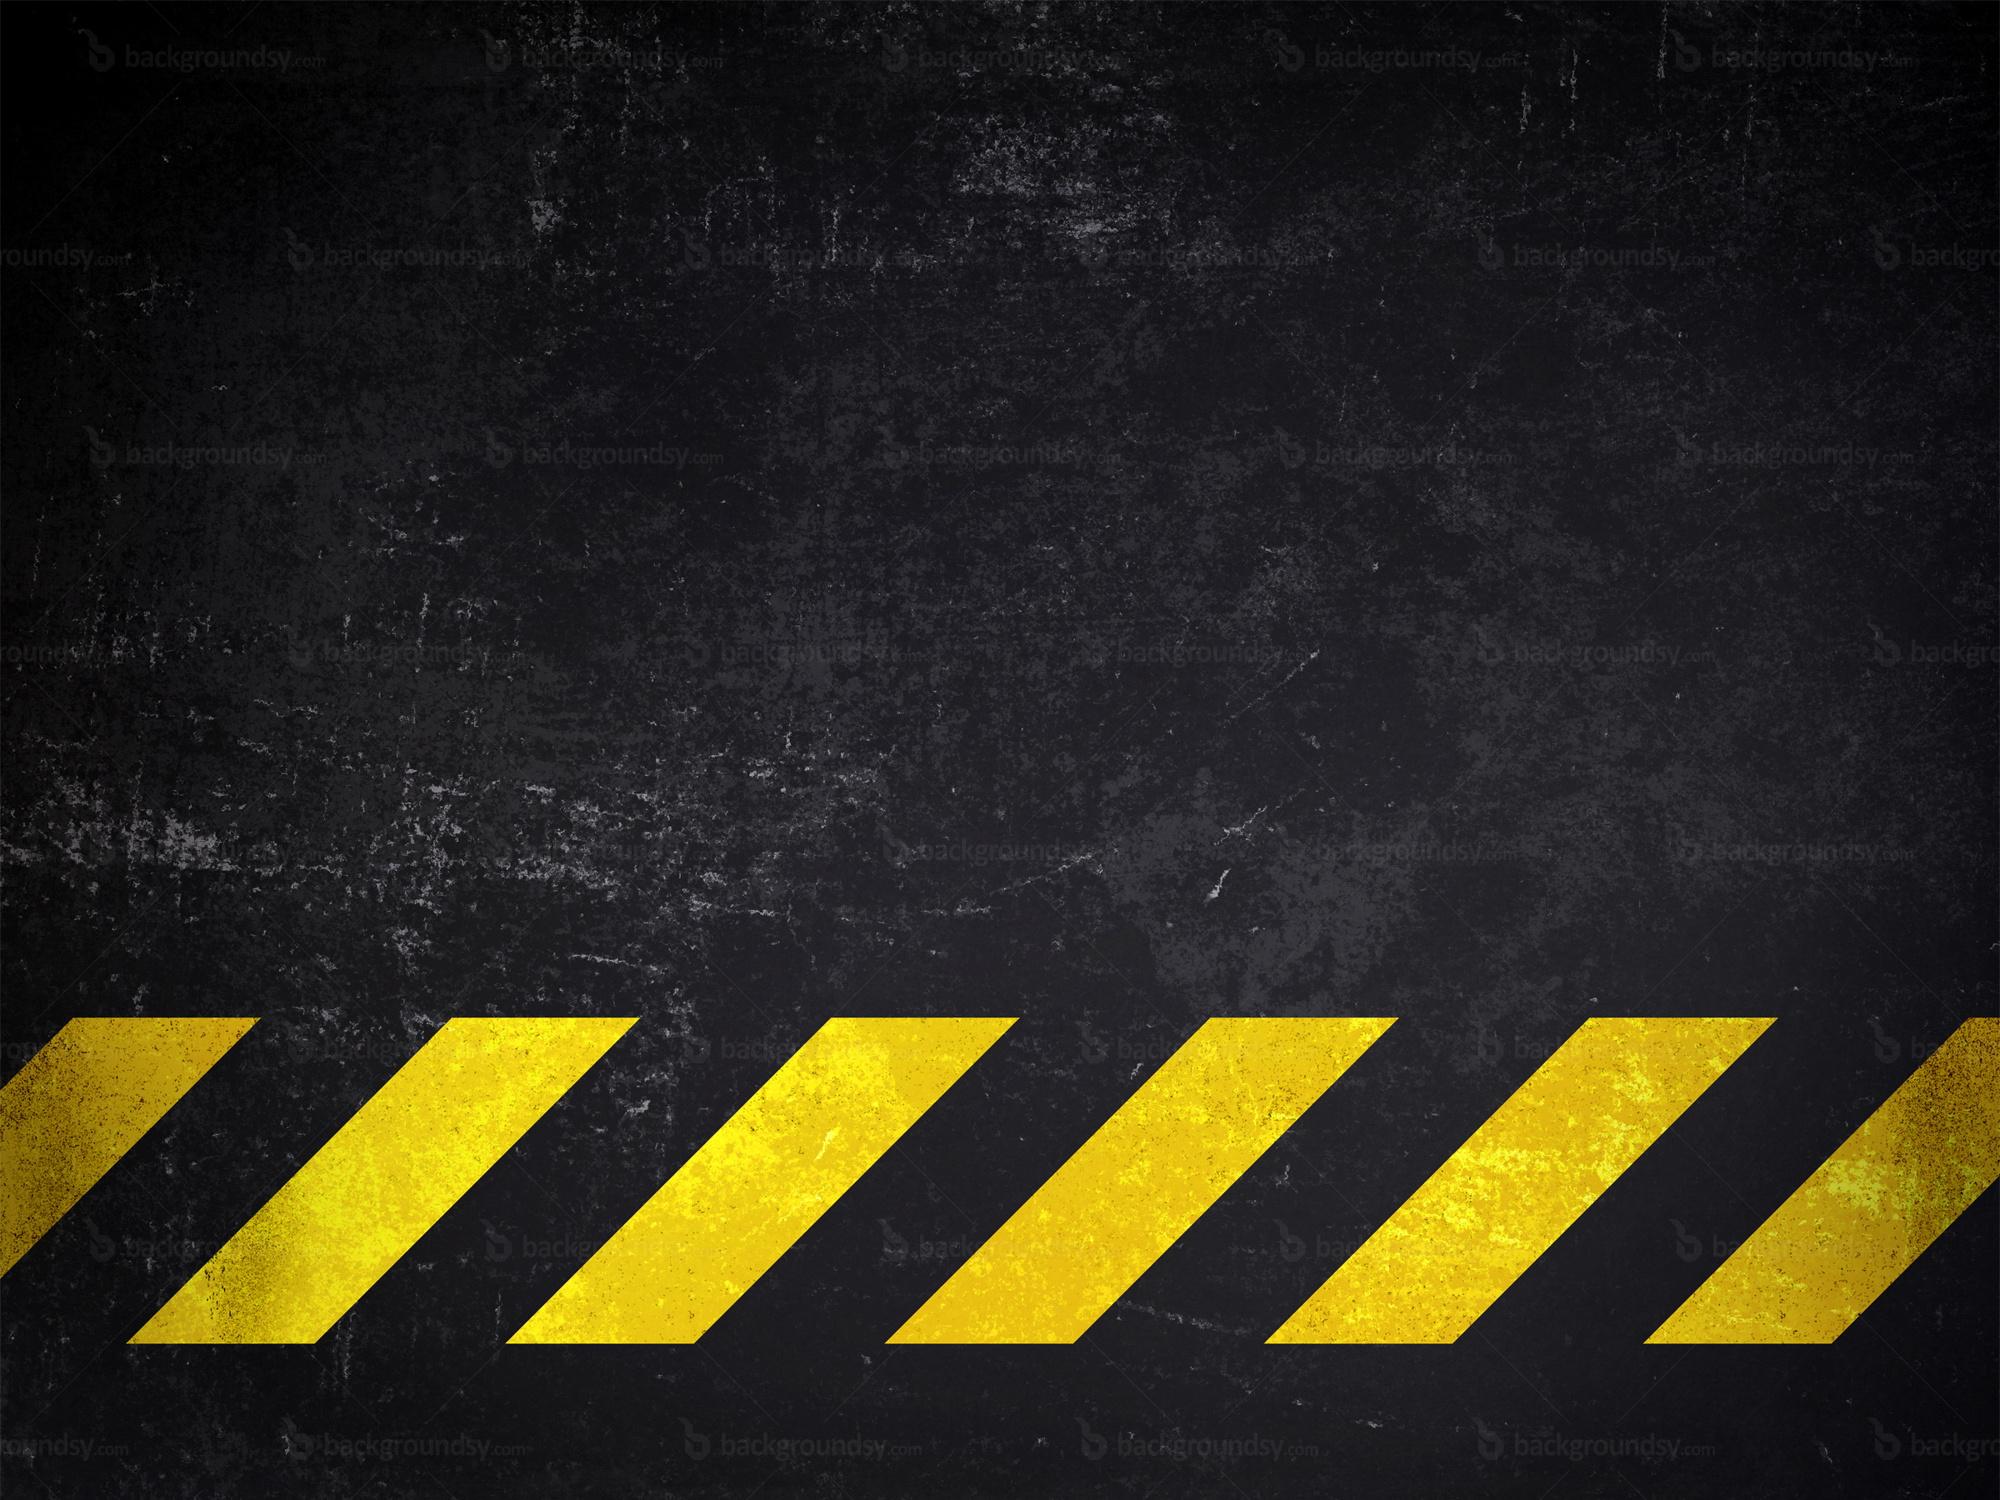 Black and Yellow Hazard Background